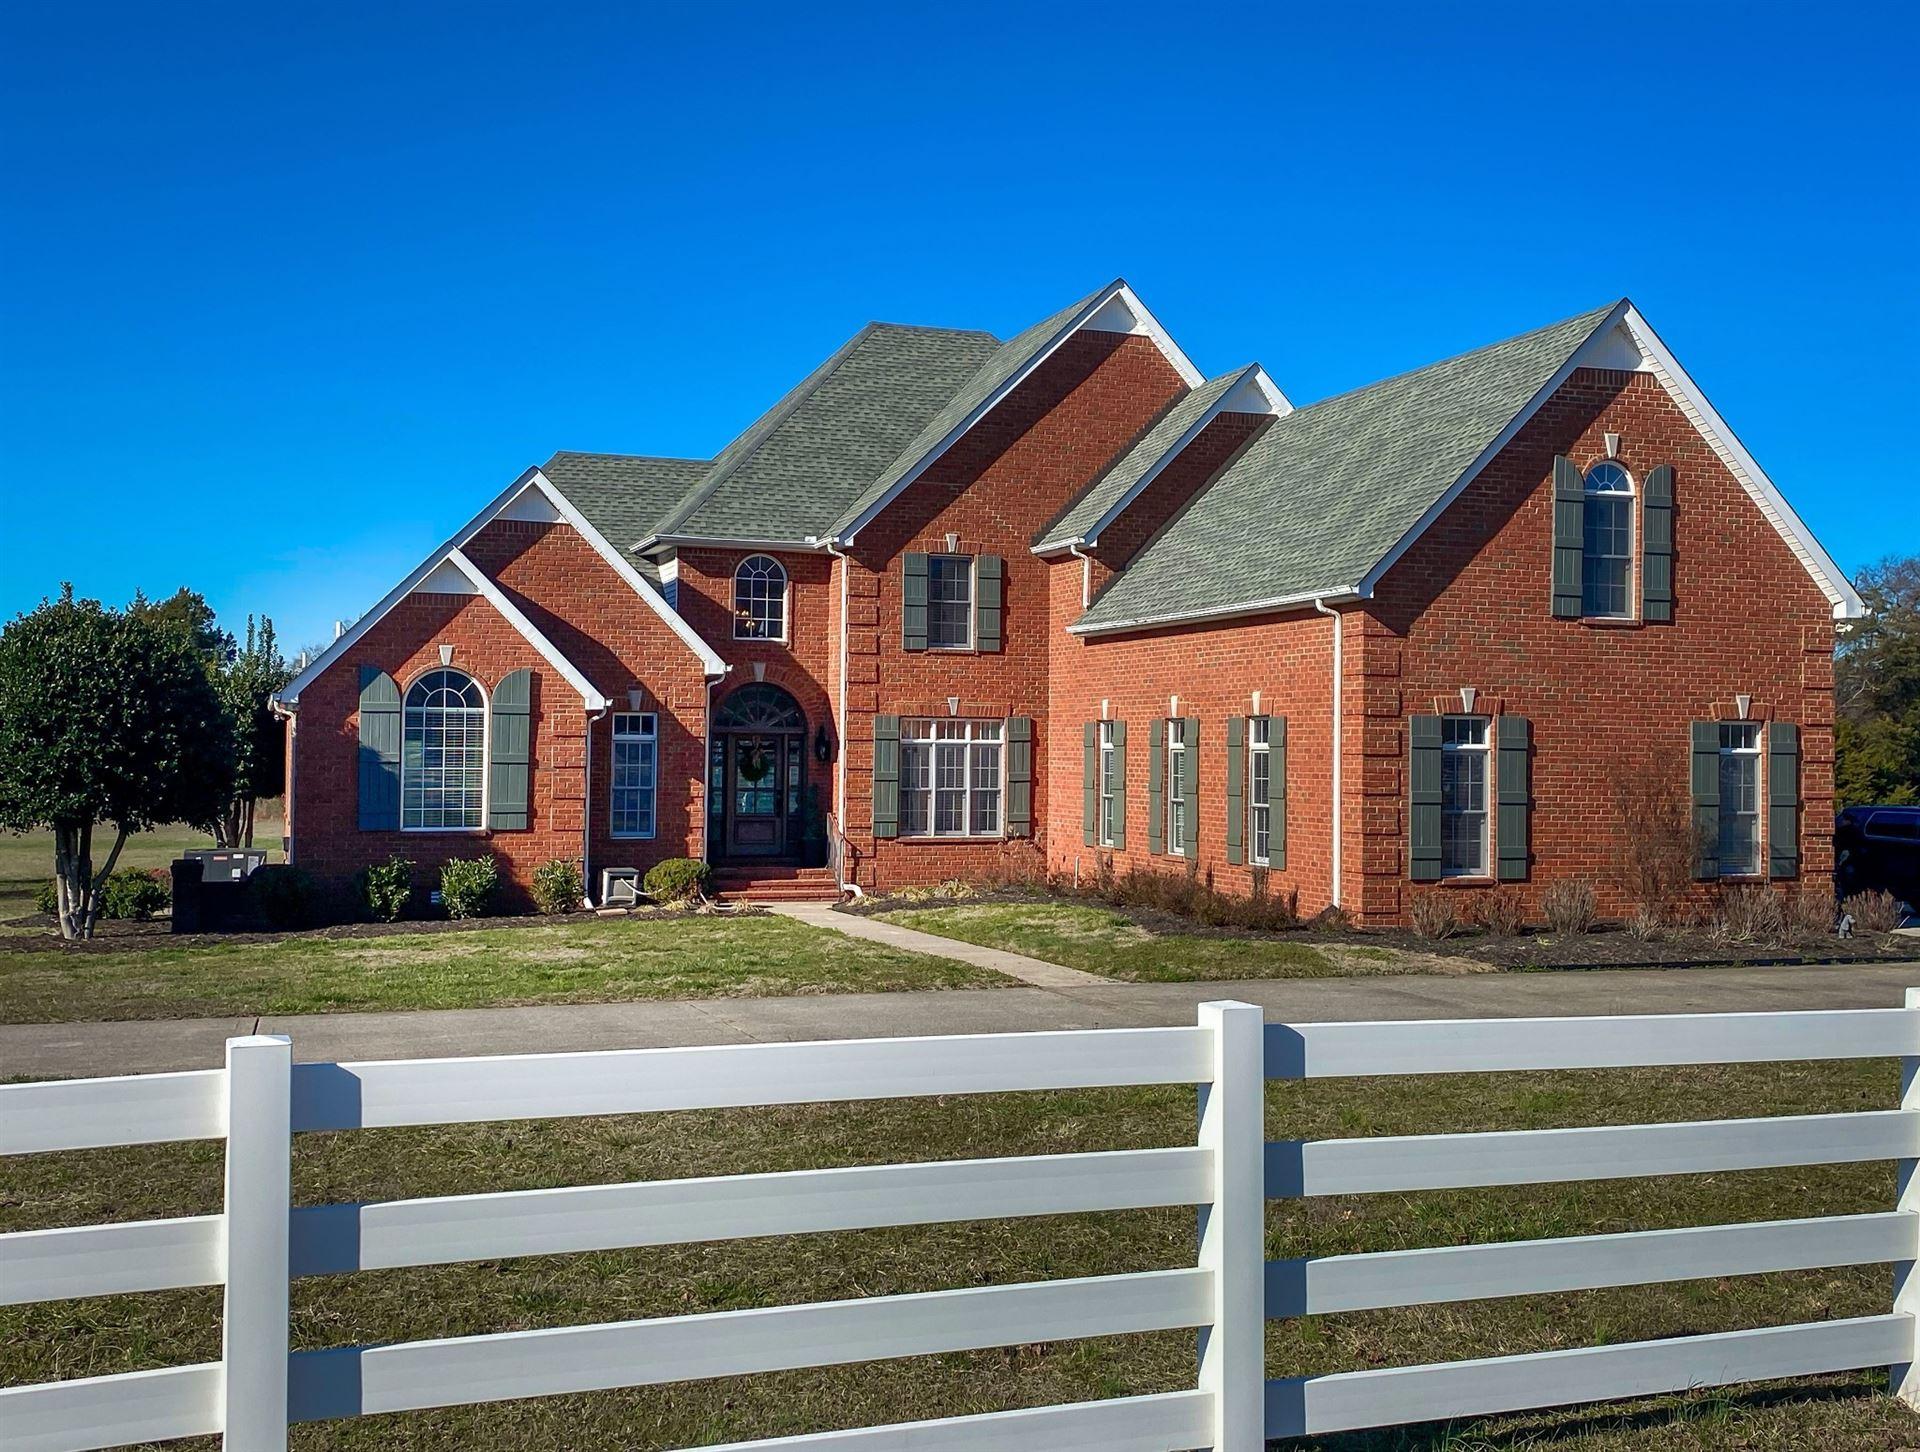 215 Churchill Farms Dr, Murfreesboro, TN 37127 - MLS#: 2181794